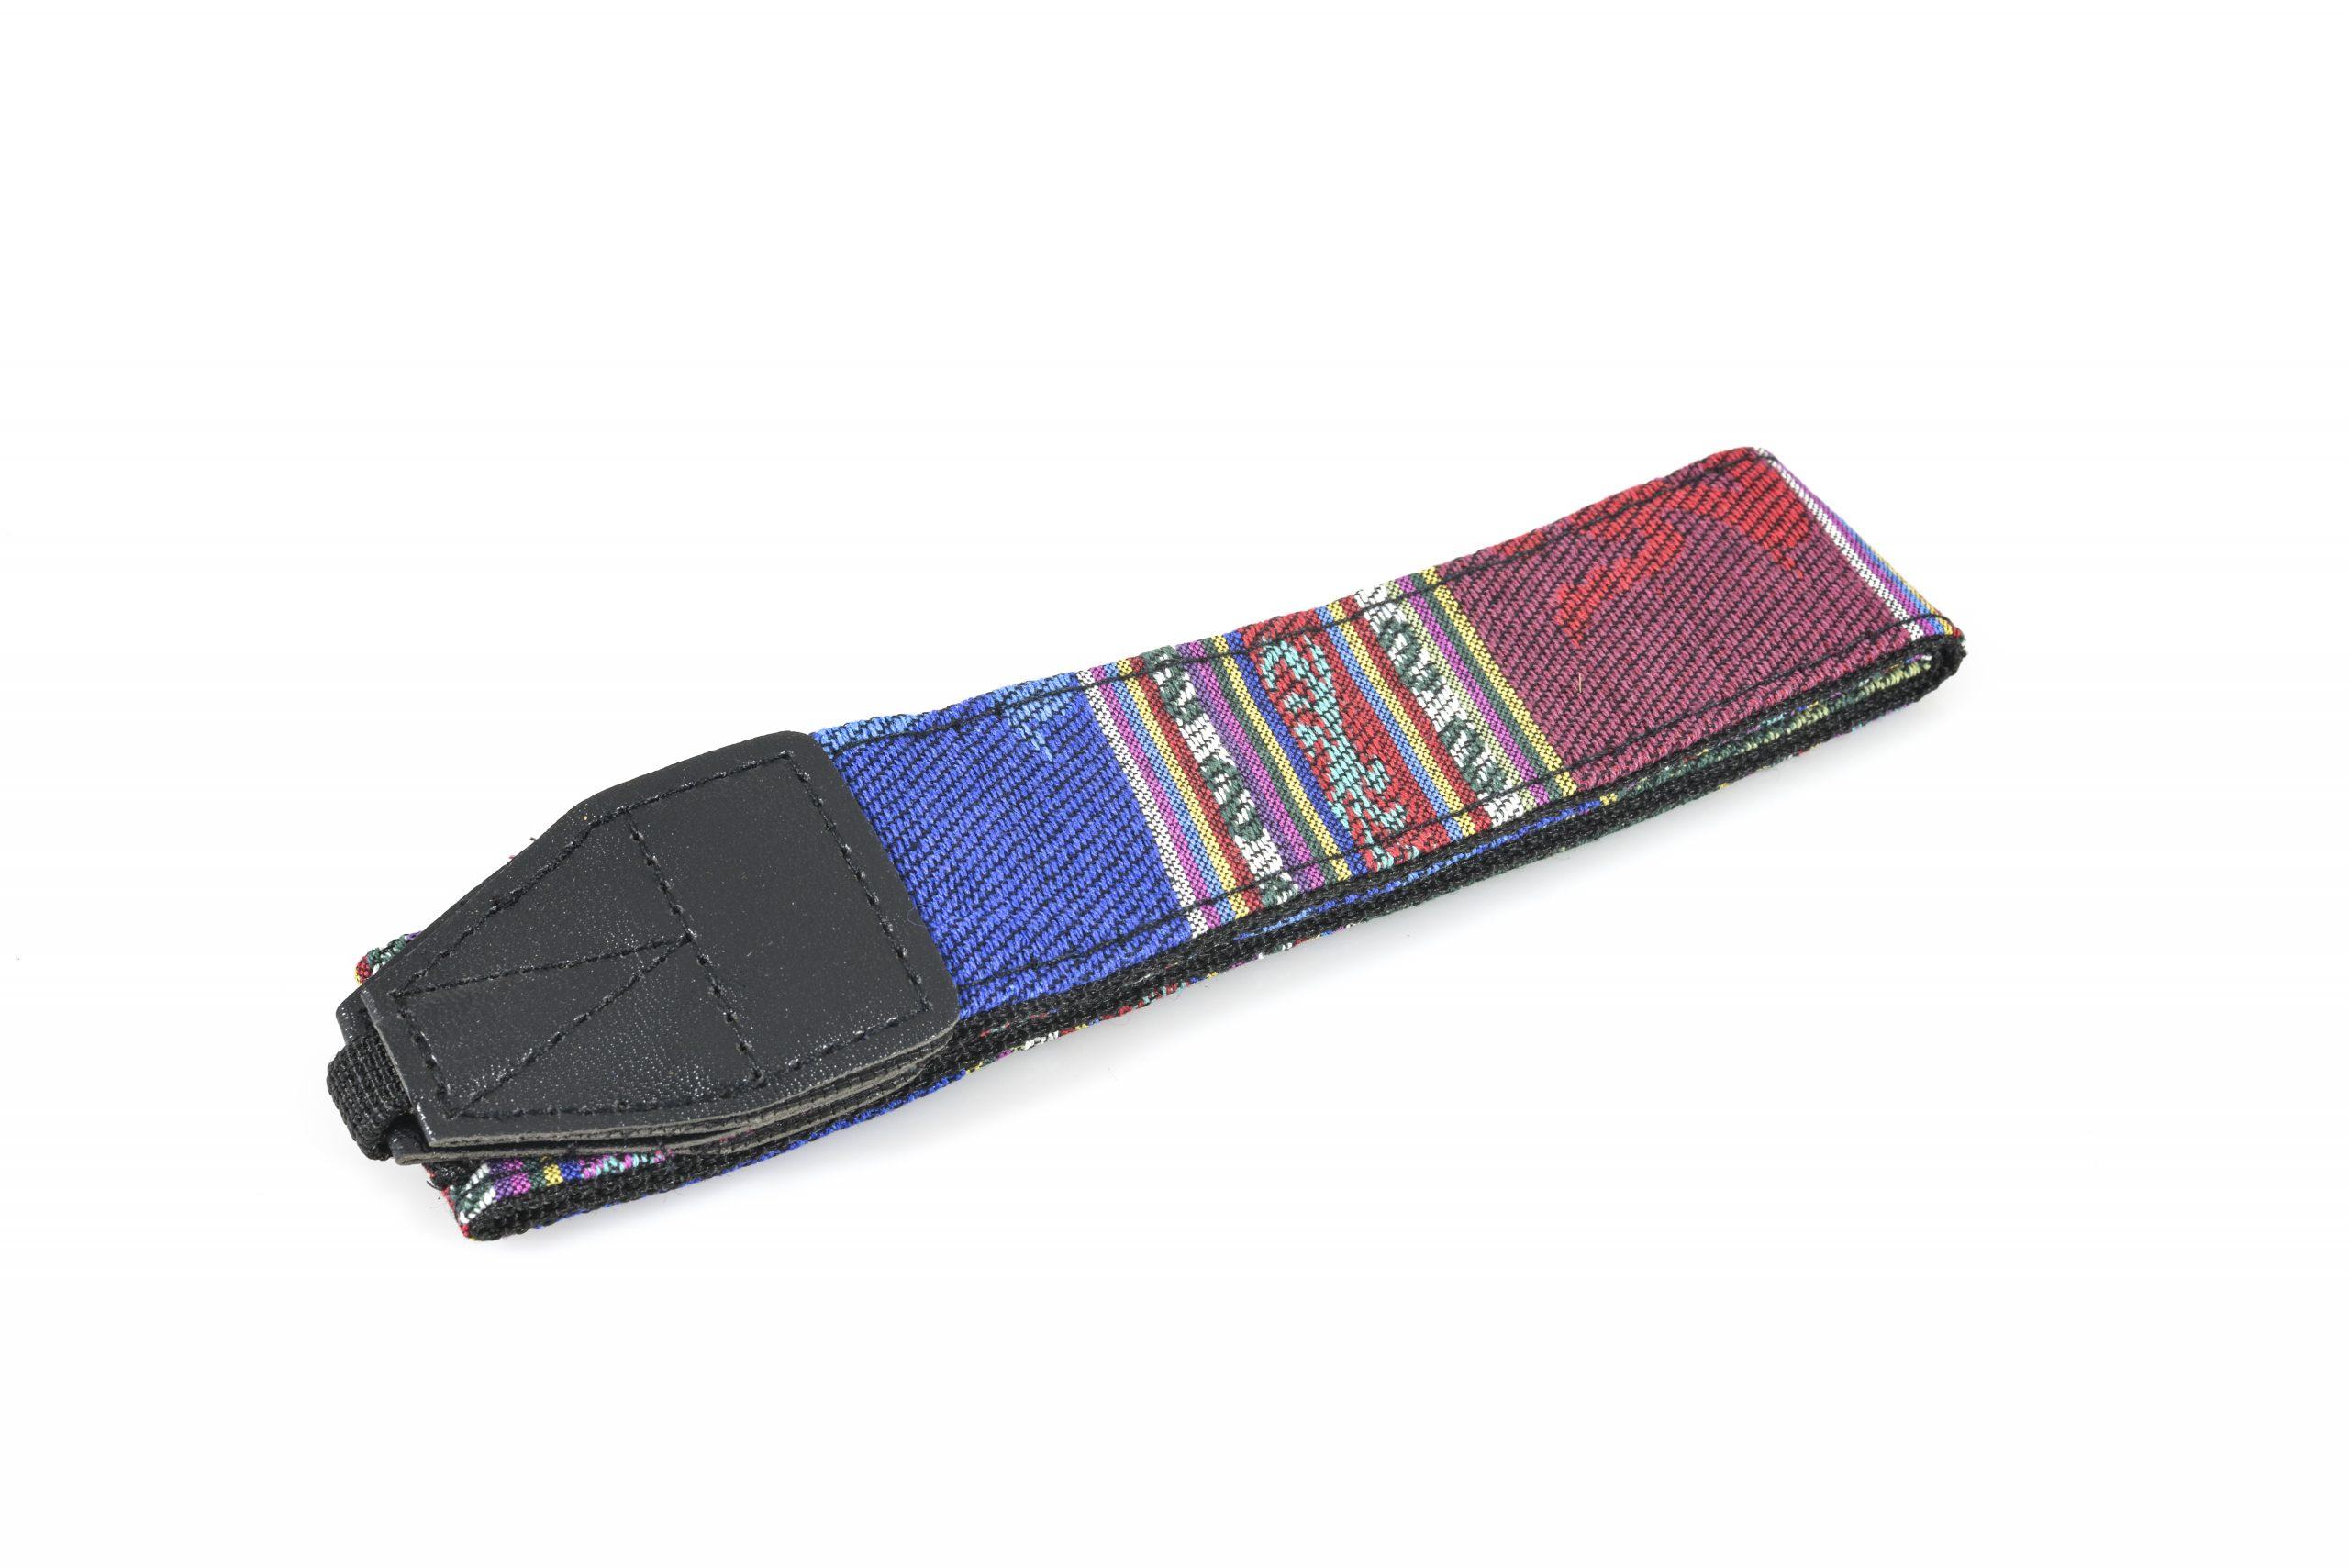 Vintage Coloured Camera Strap for Canon, Sony, Nikon Cameras etc (Blue Stripe)